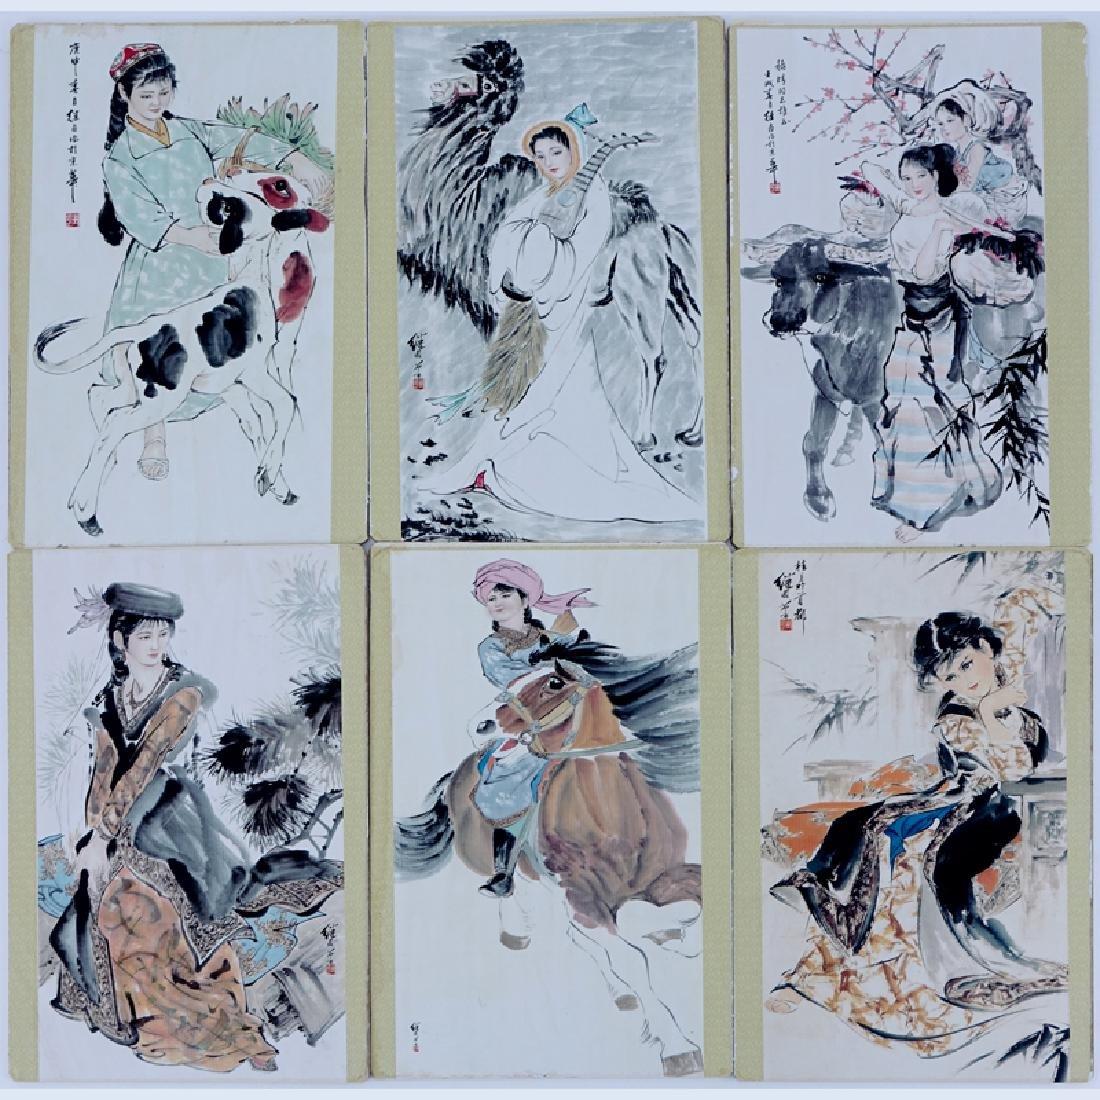 Six (6) Color Cardboard Prints in the Style of Ji Lu.